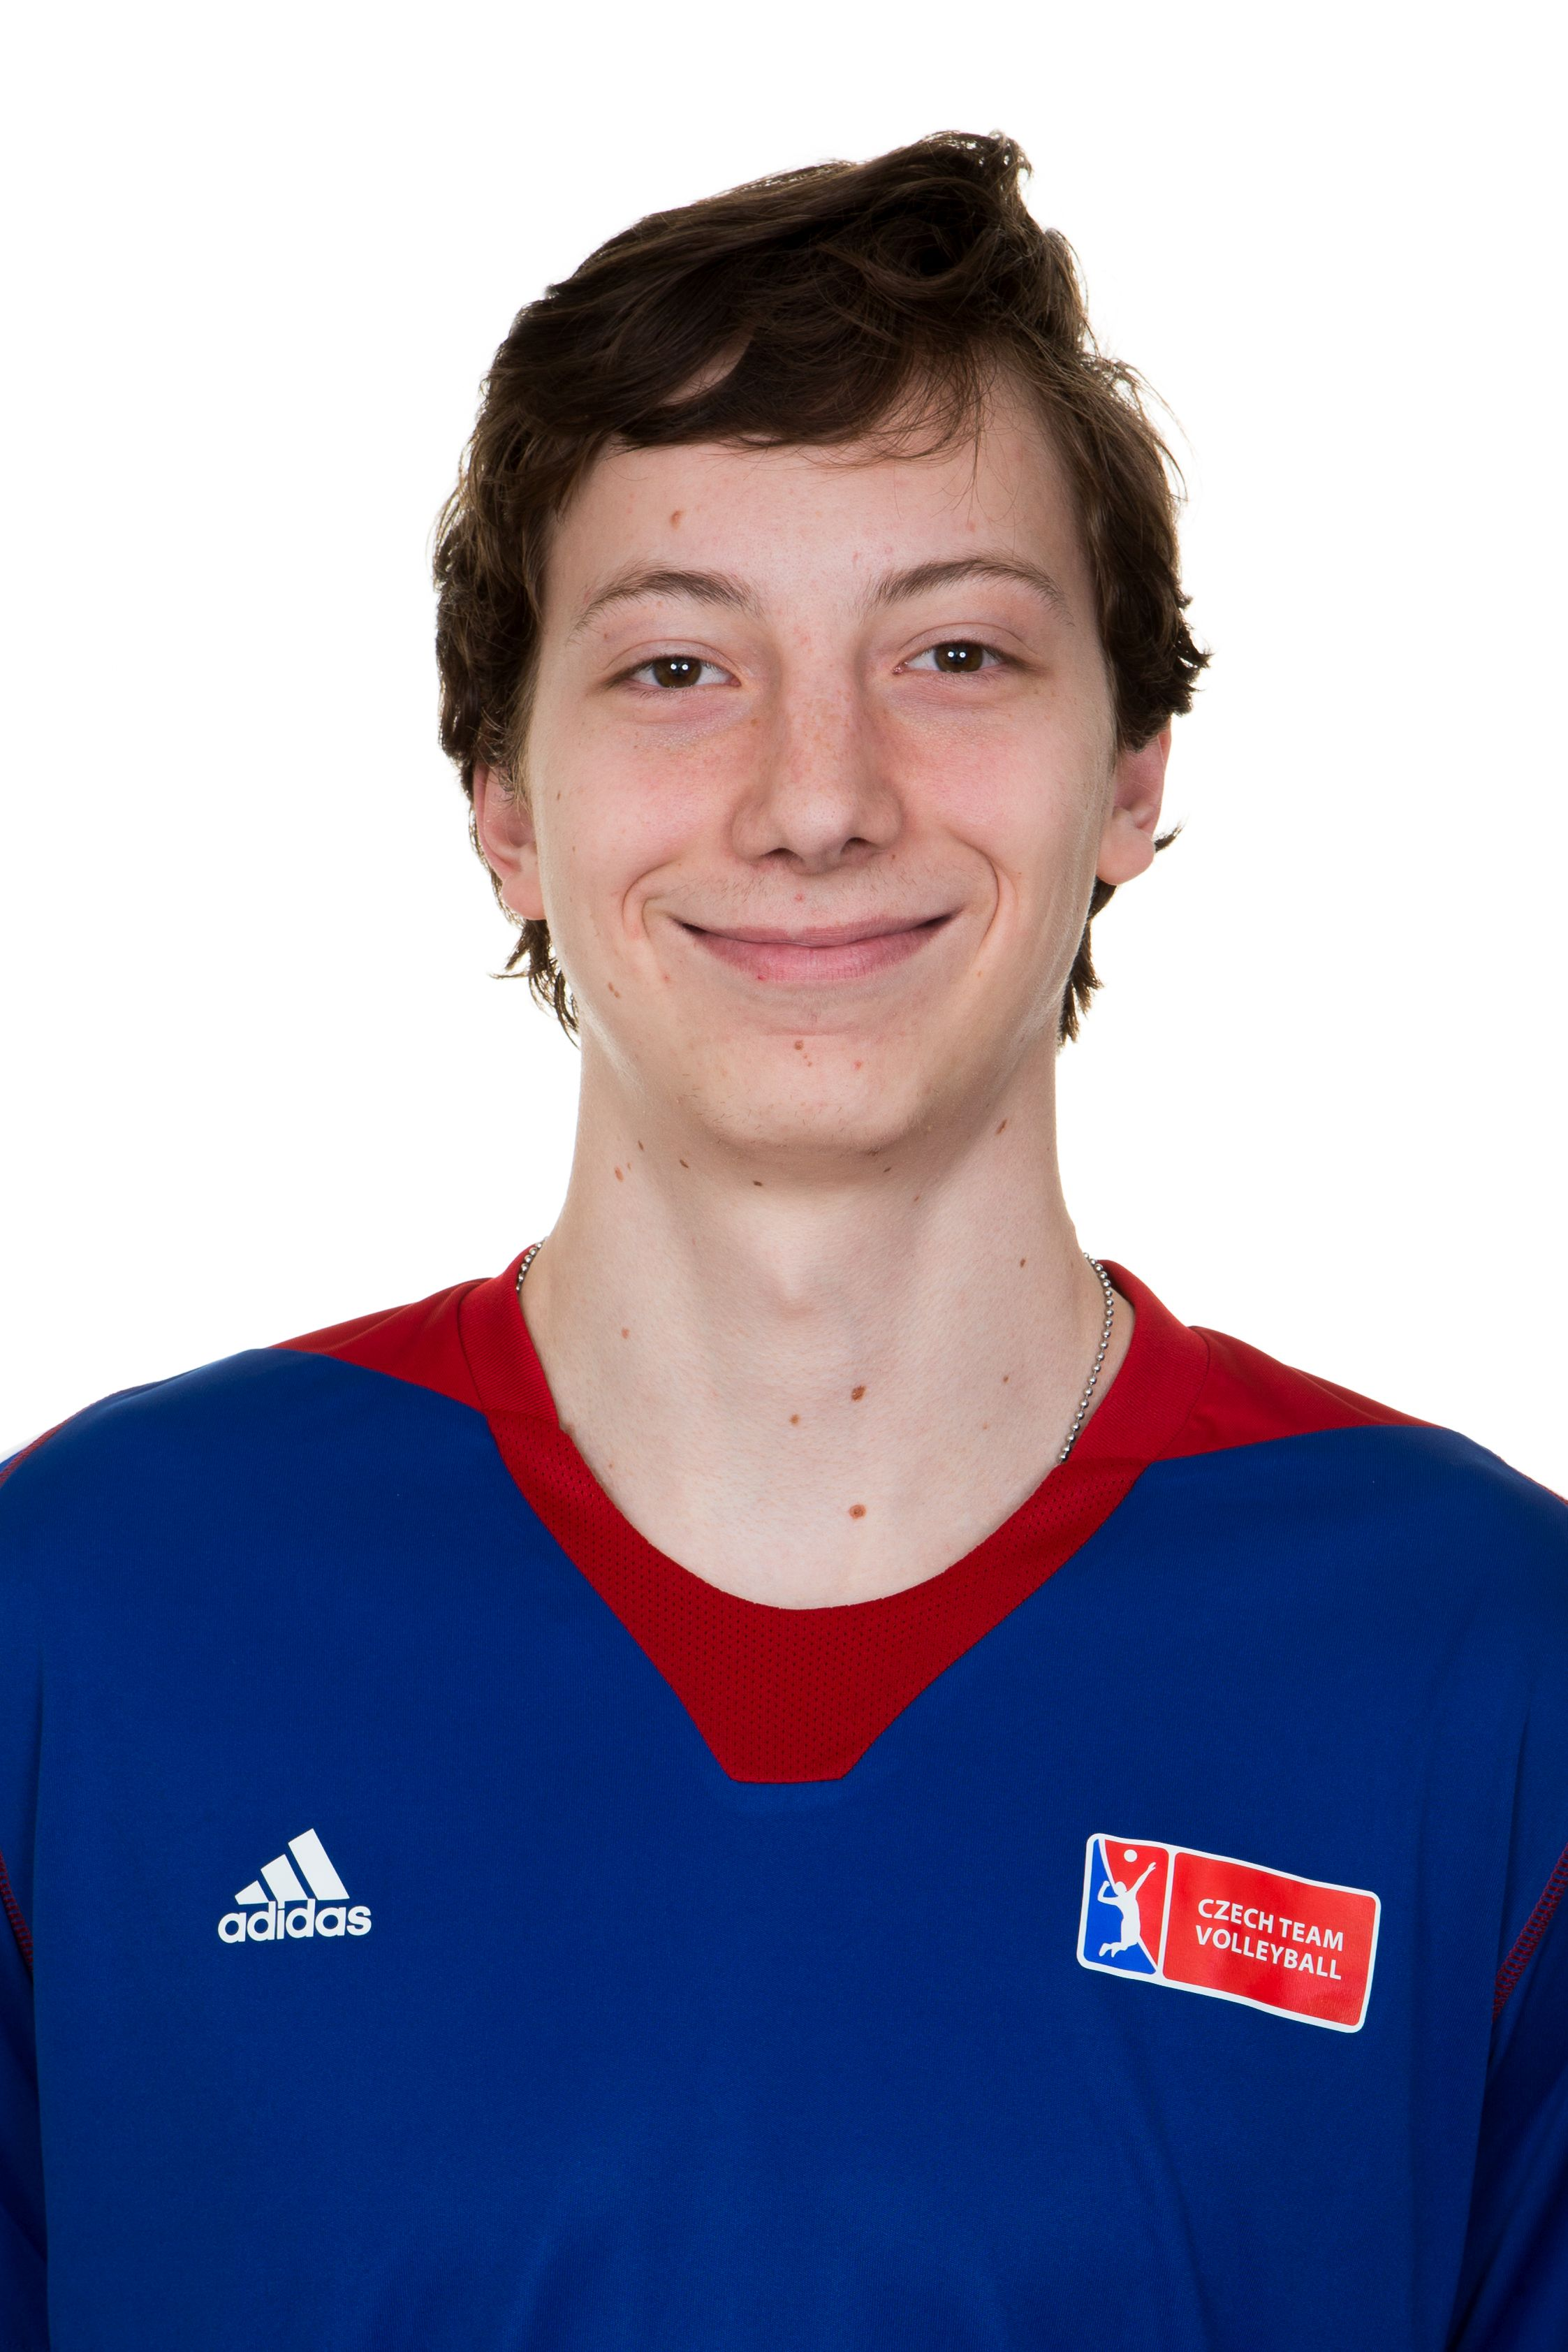 Adam Bartos